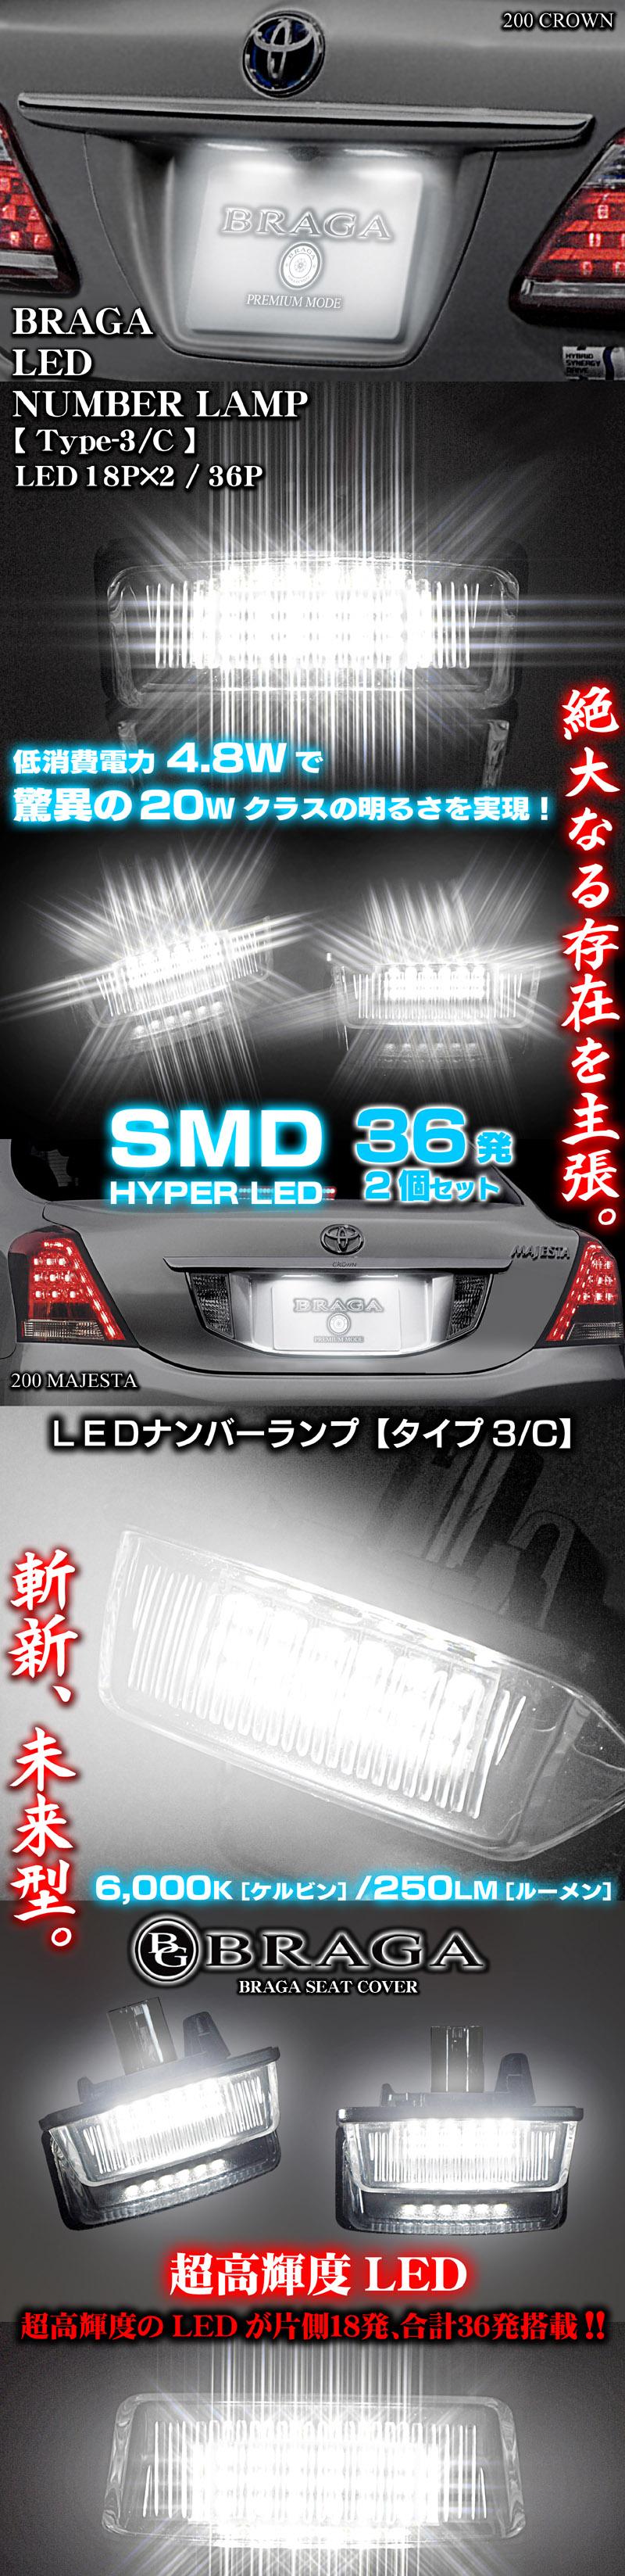 LEDナンバーランプ灯[タイプ3/C]LEDナンバーランプ灯【トヨタ車】ライセンスランプ・左右2個セット/片側18発/合計36発